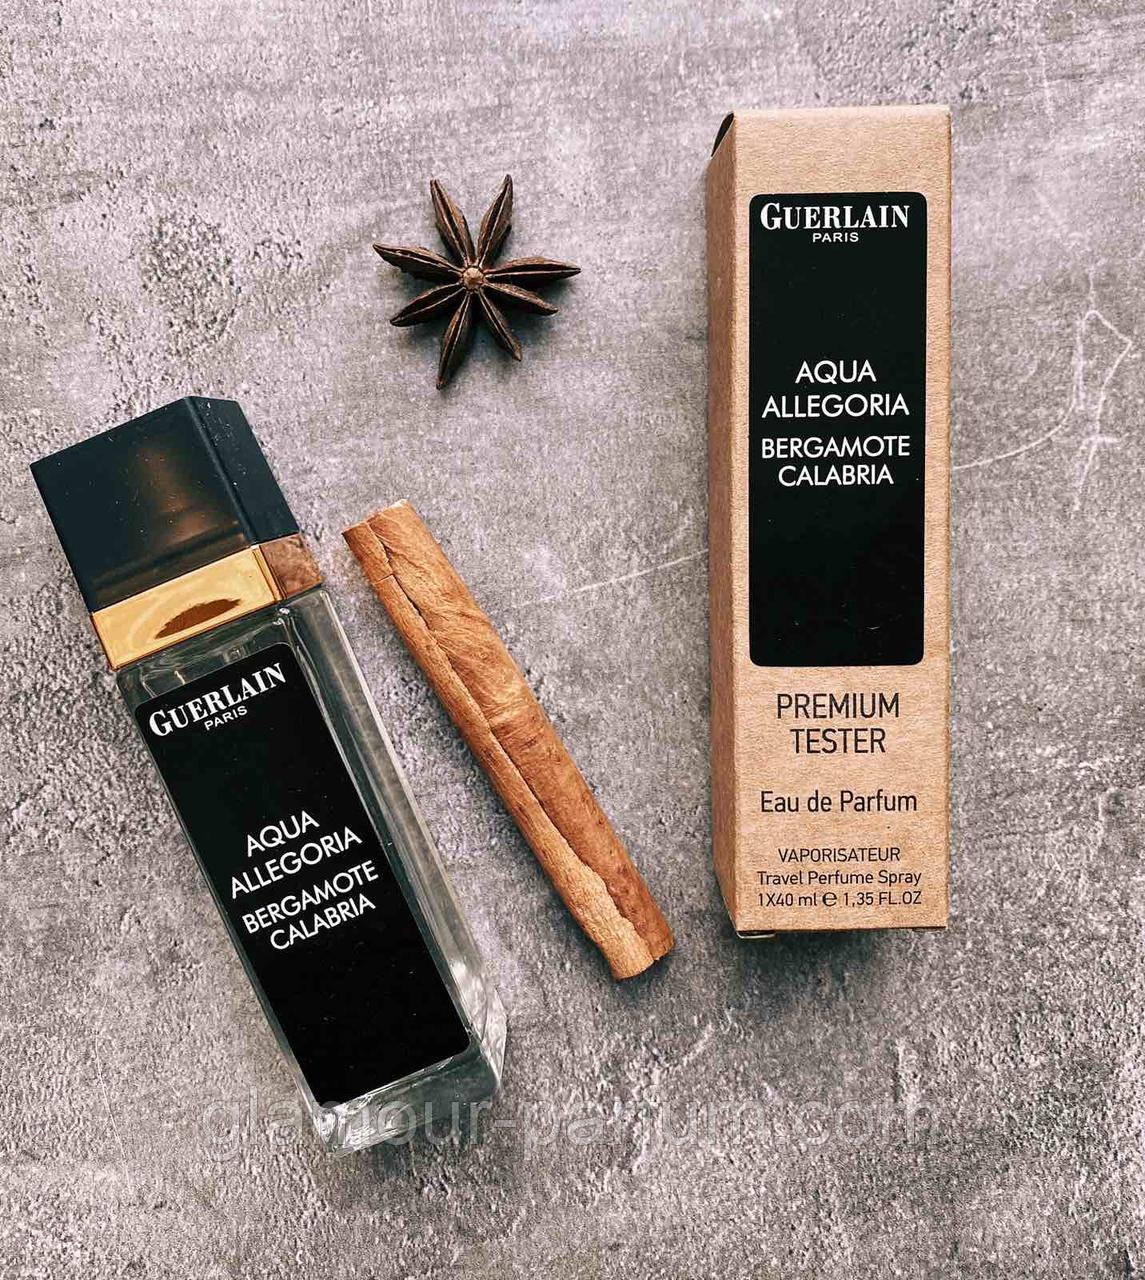 TESTER жіночий міні-парфуми Guerlain Aqua Allegoria Bergamote Calabria 40мл репліка ОПТ